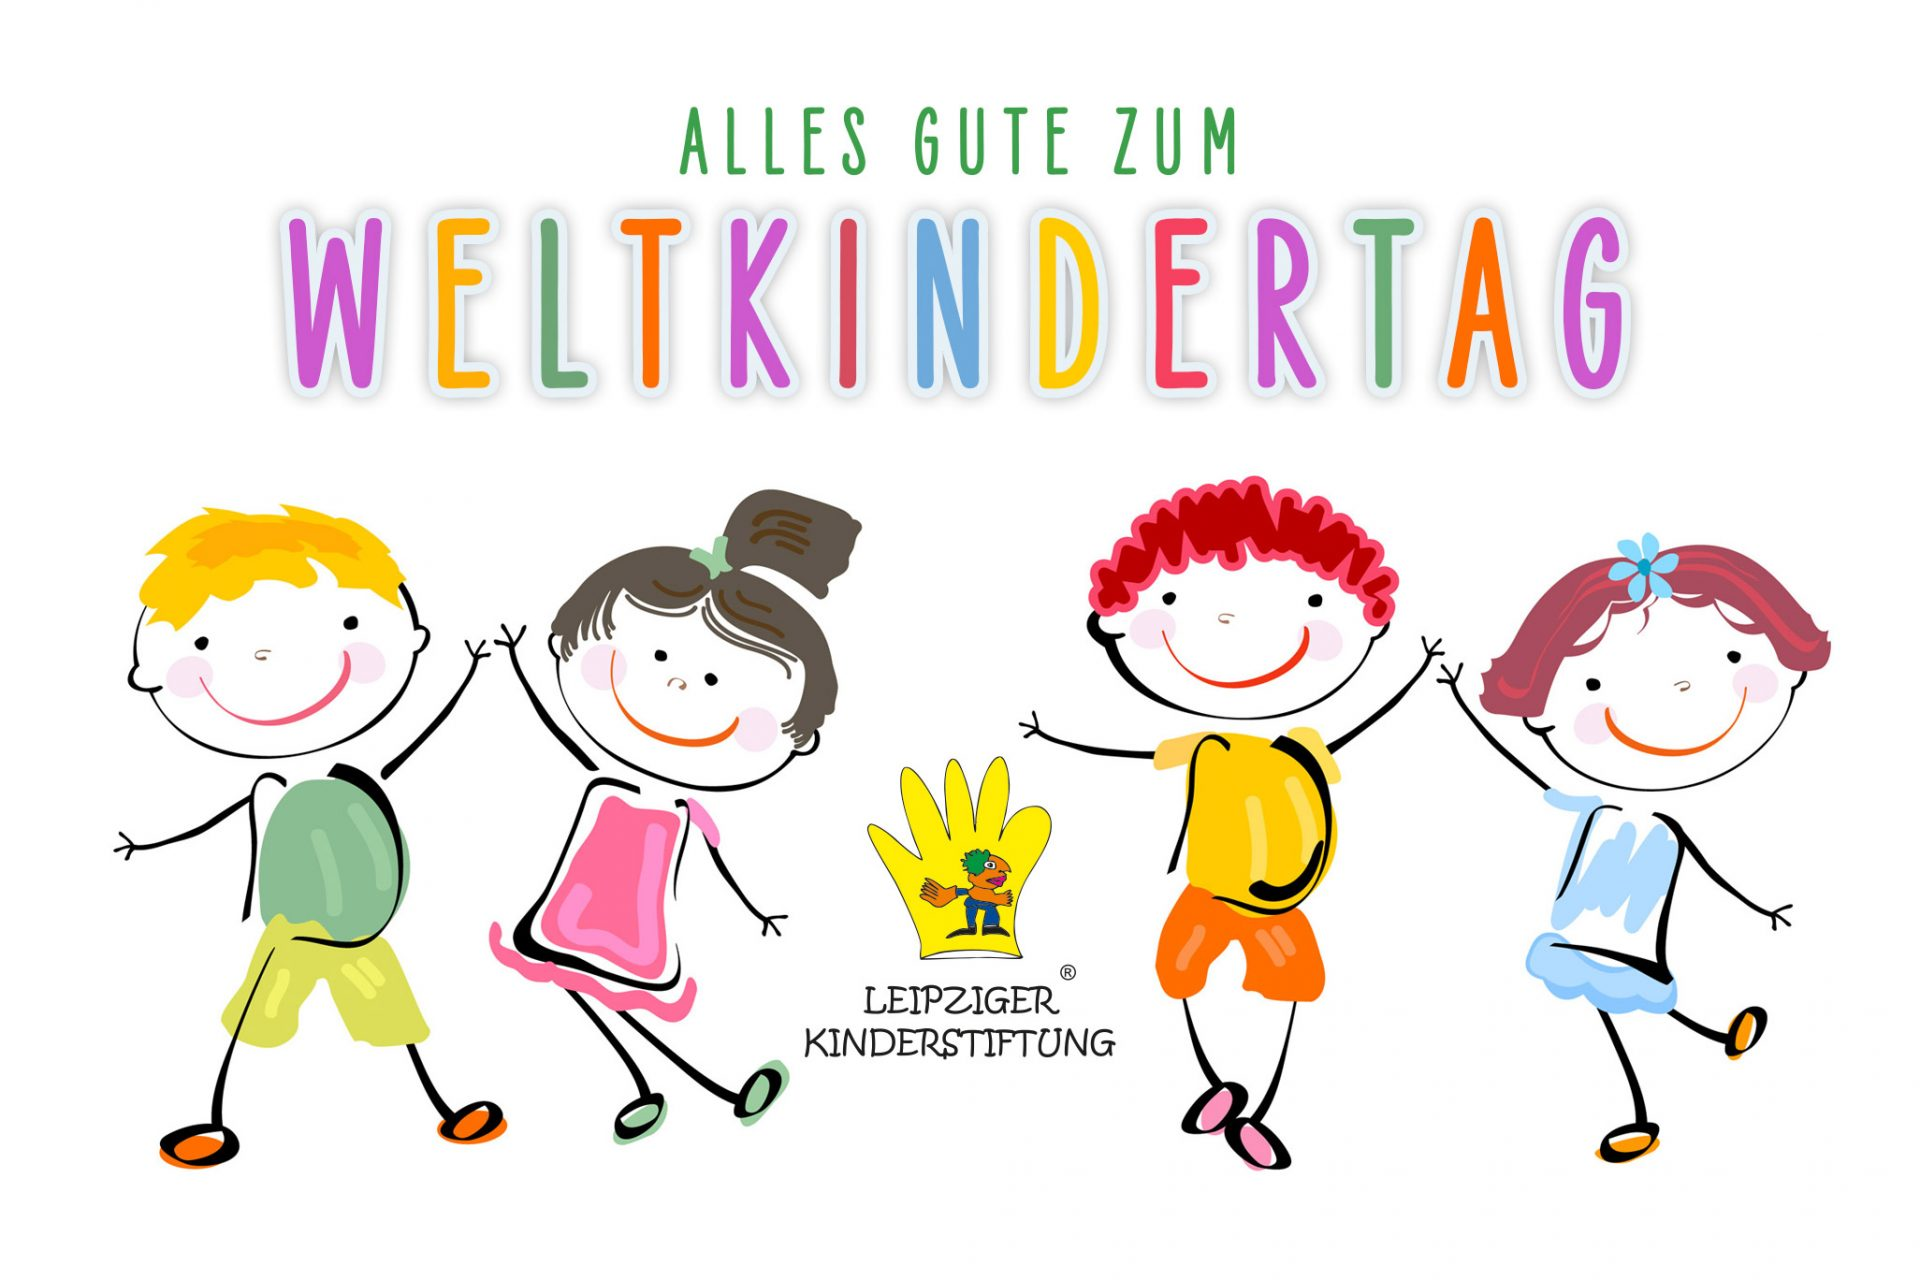 WELTKINDERTAG - Leipziger Kinderstiftung - 2021